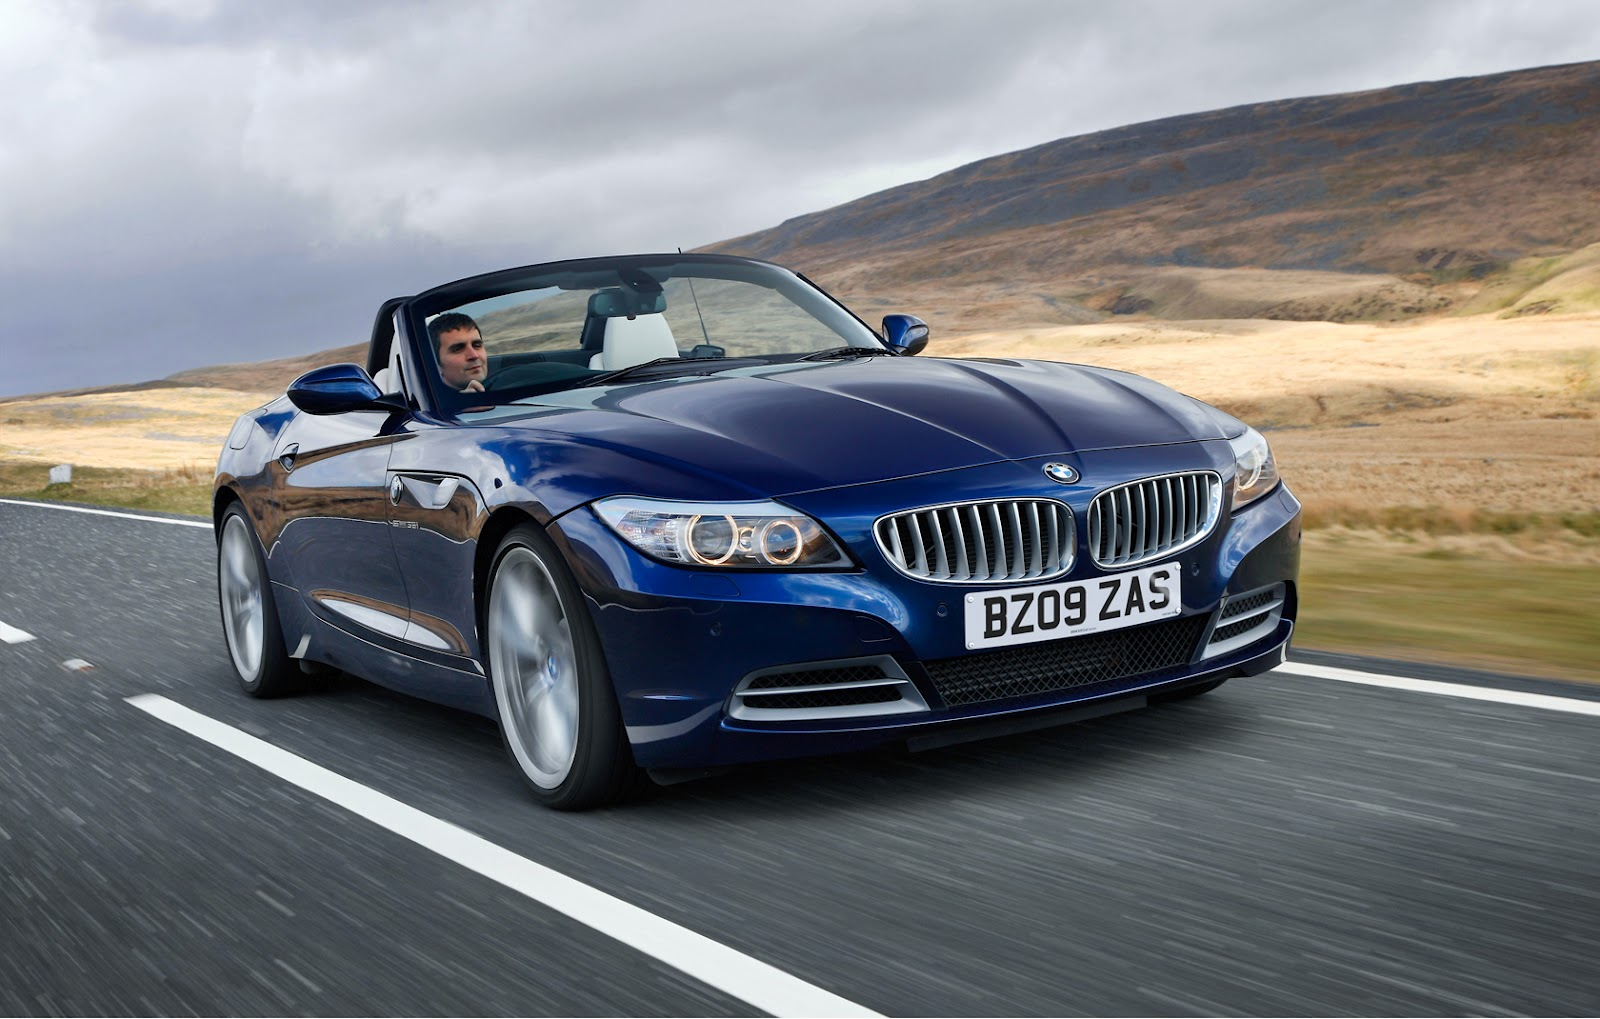 Luxury Cars Vehicle: Sports Cars